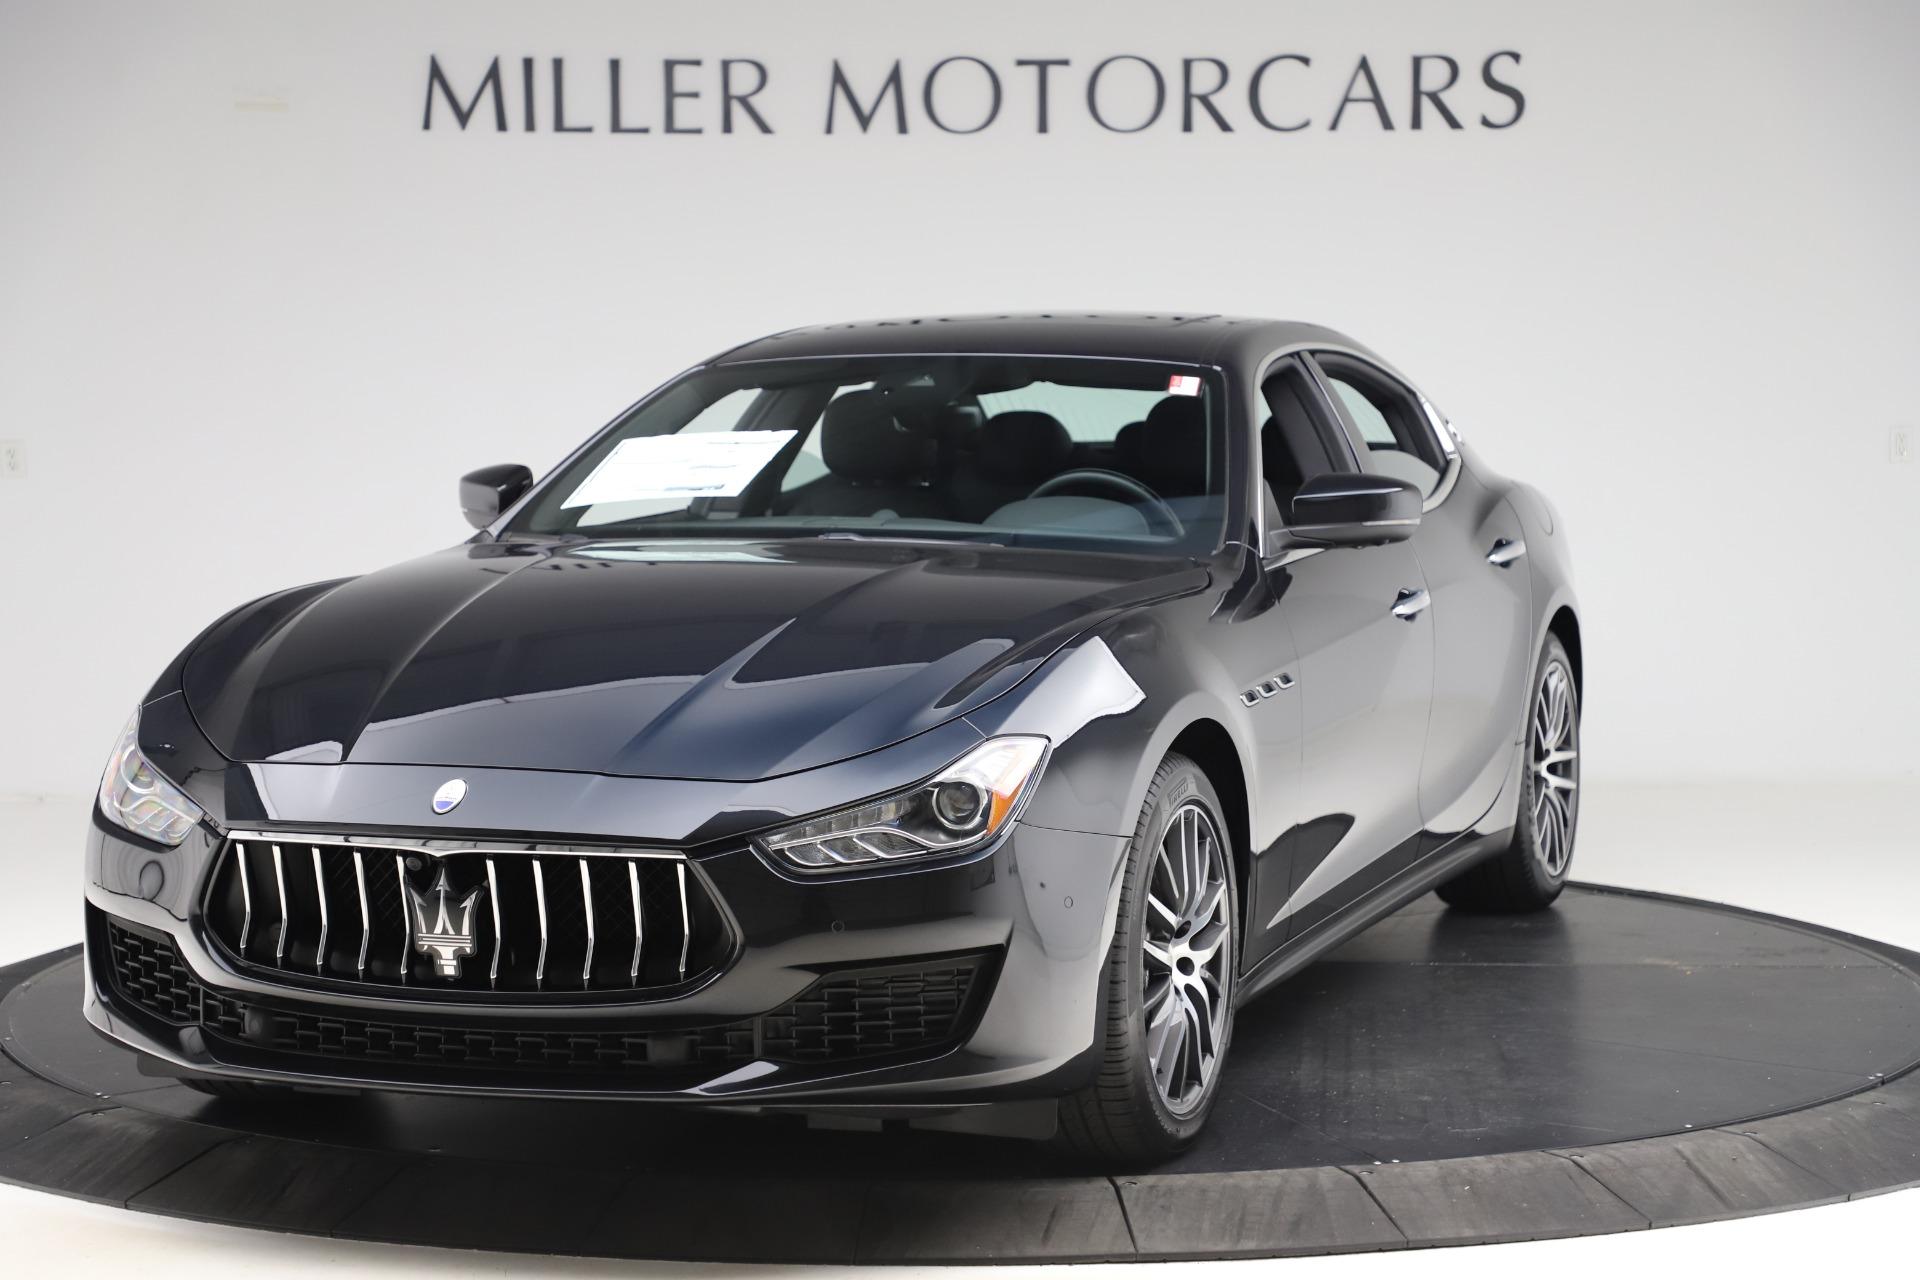 New 2019 Maserati Ghibli S Q4 for sale Sold at Maserati of Westport in Westport CT 06880 1